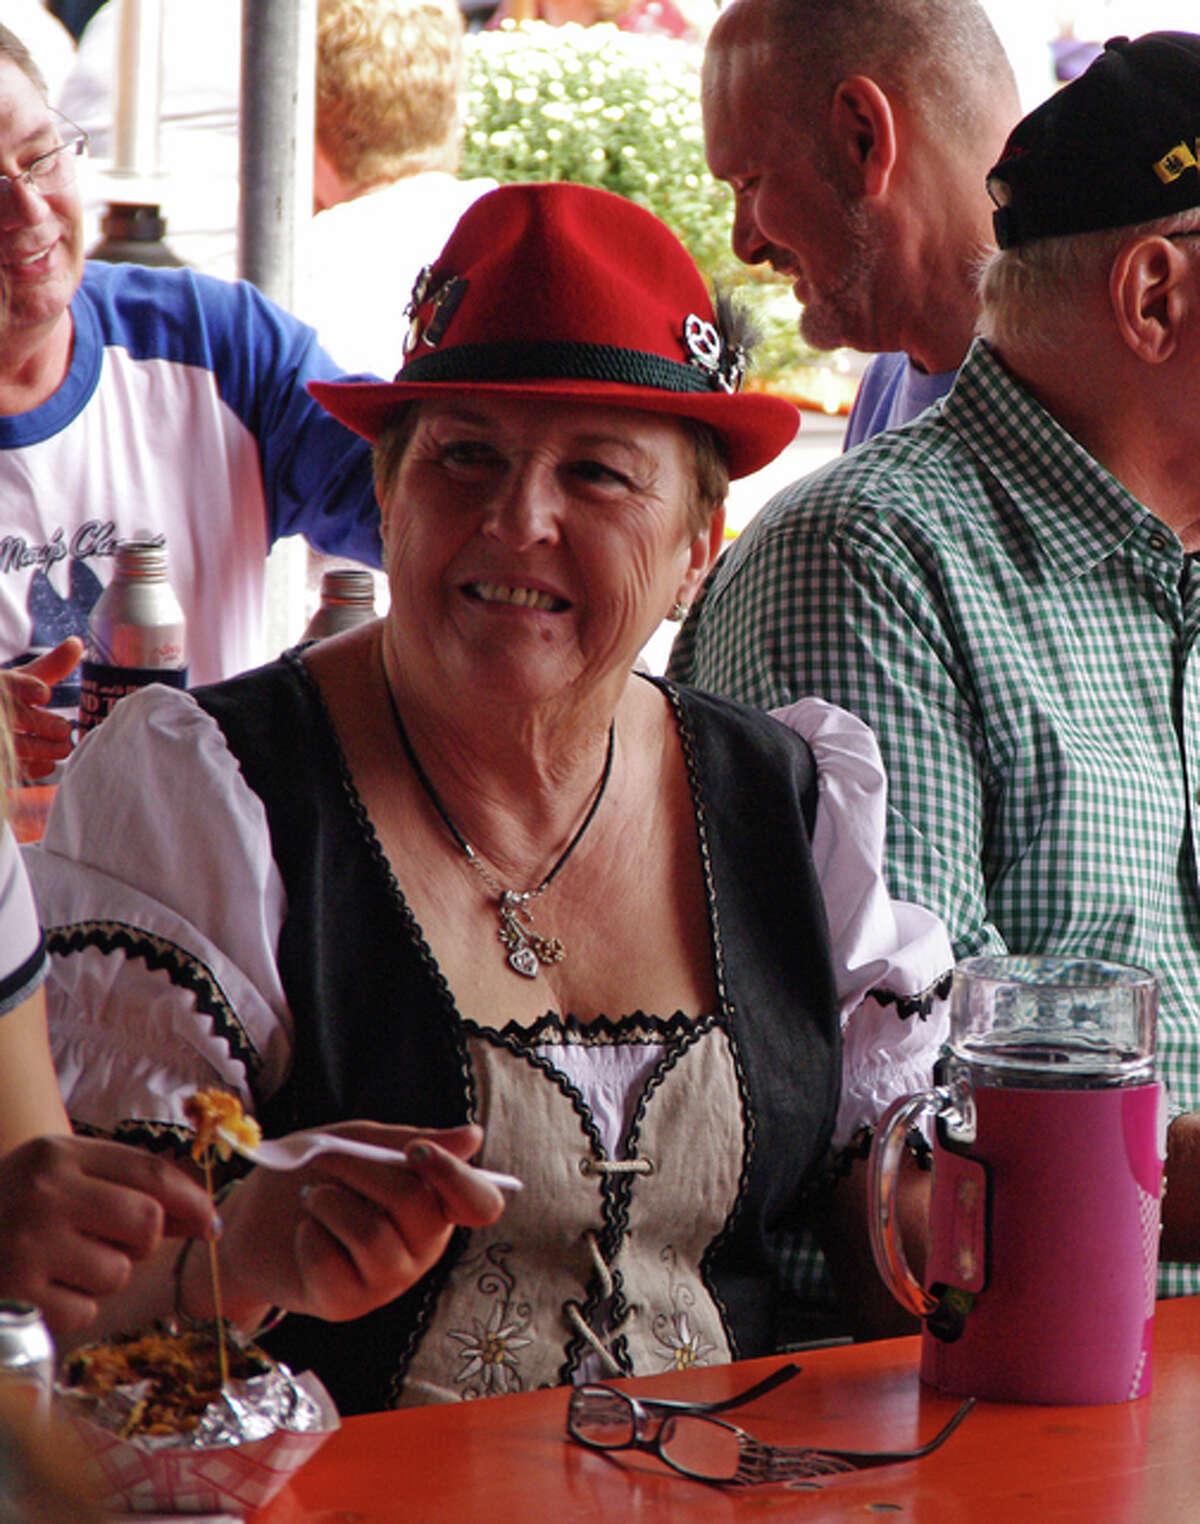 Marilyn Kuhn, of Godfrey, enjoys the St. Mary's Oktoberfest in Alton Sunday.